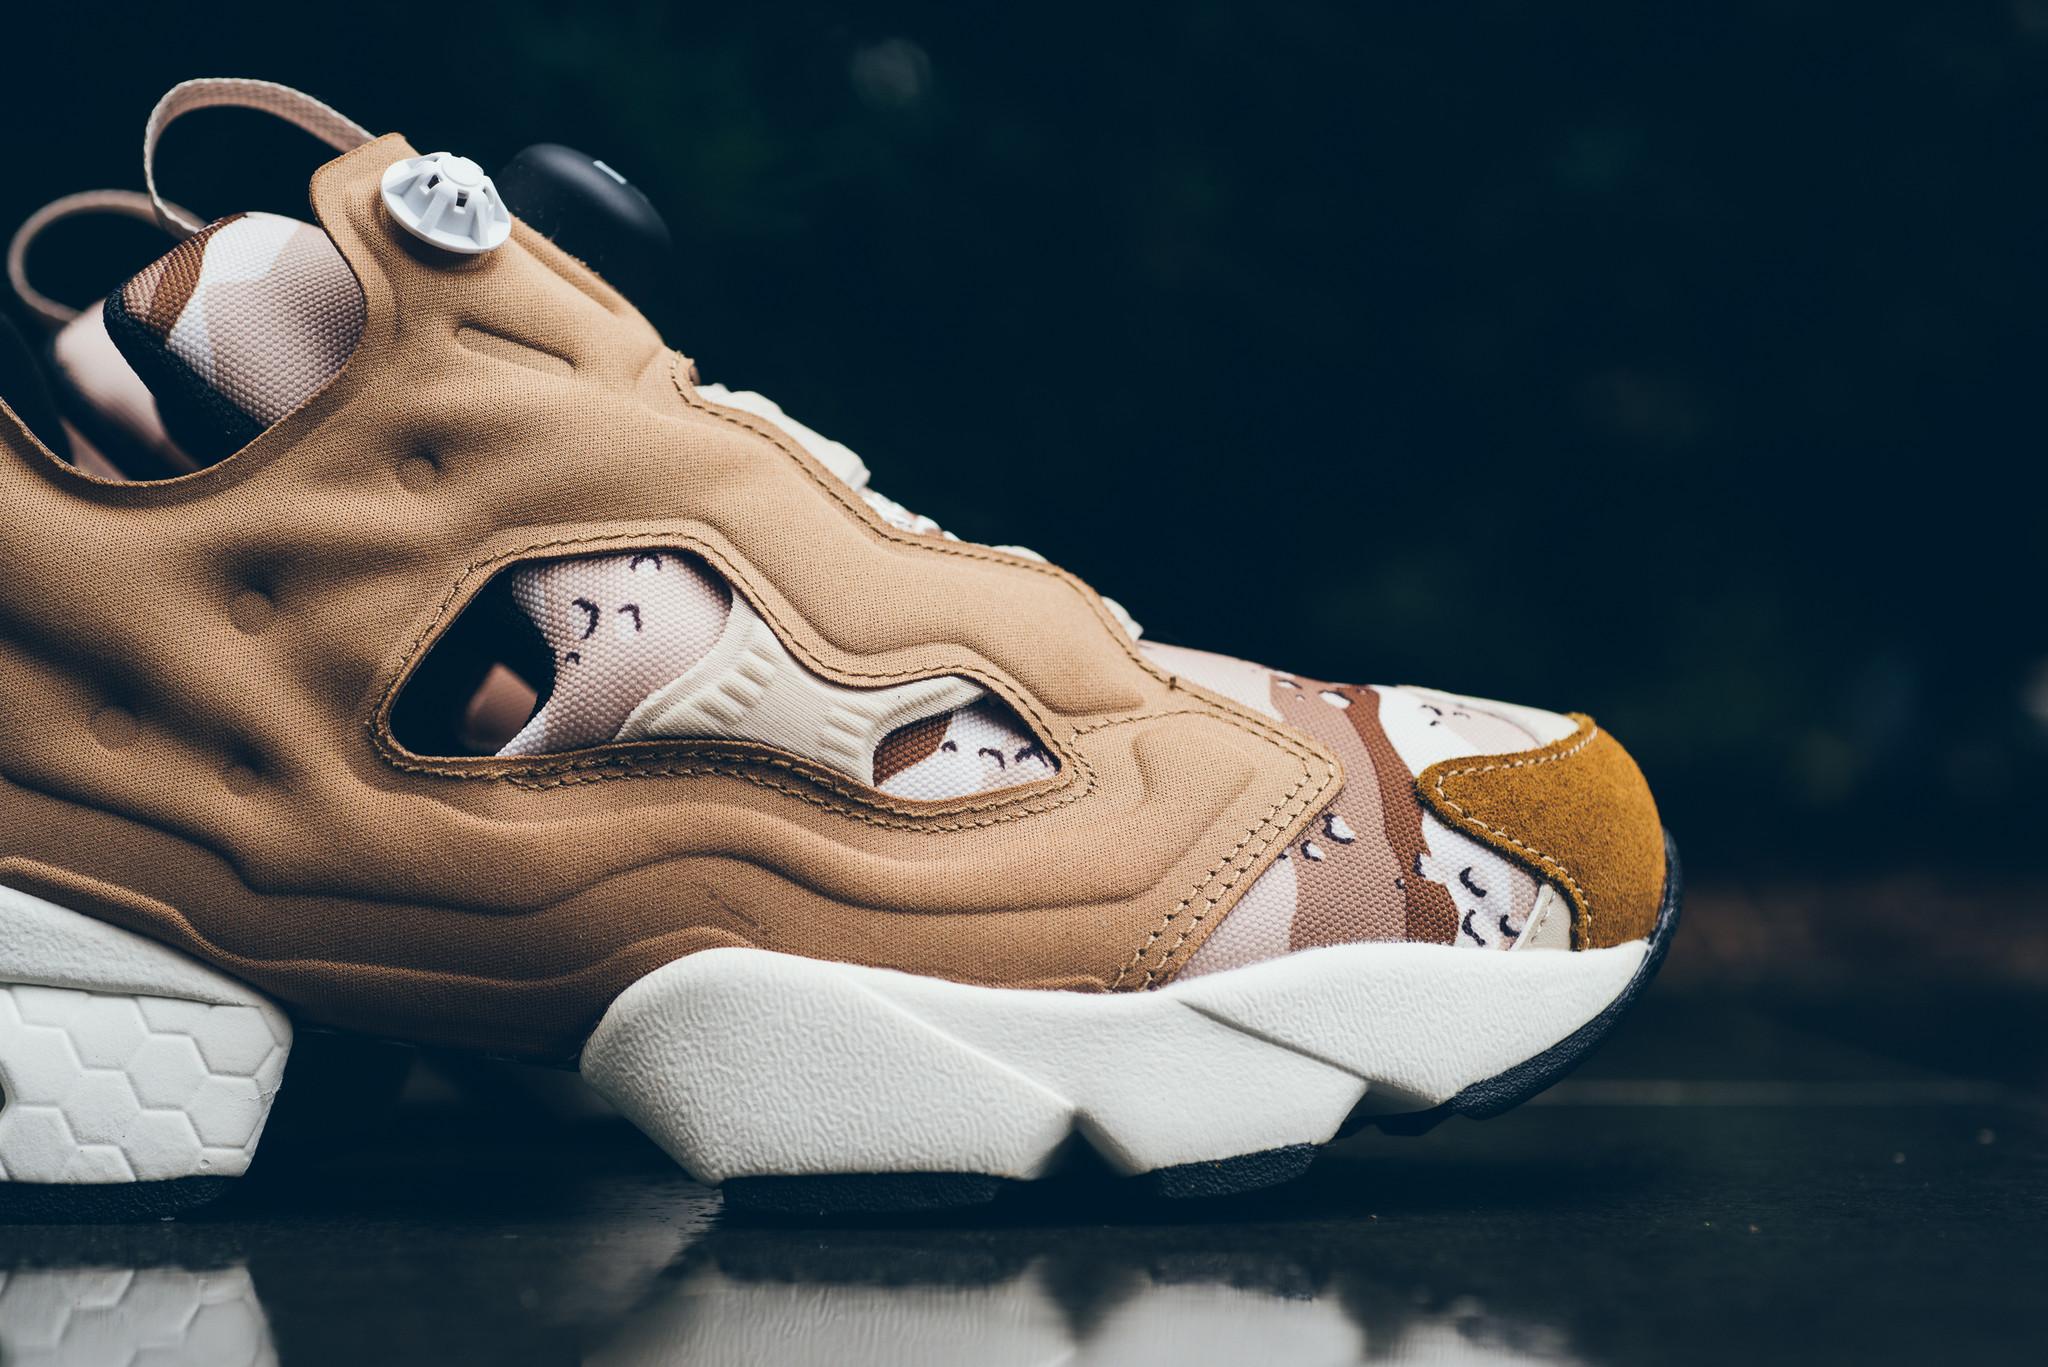 Instapump_Fury_OG_Camo_Sneaker_POlitics_Hypebeast_14